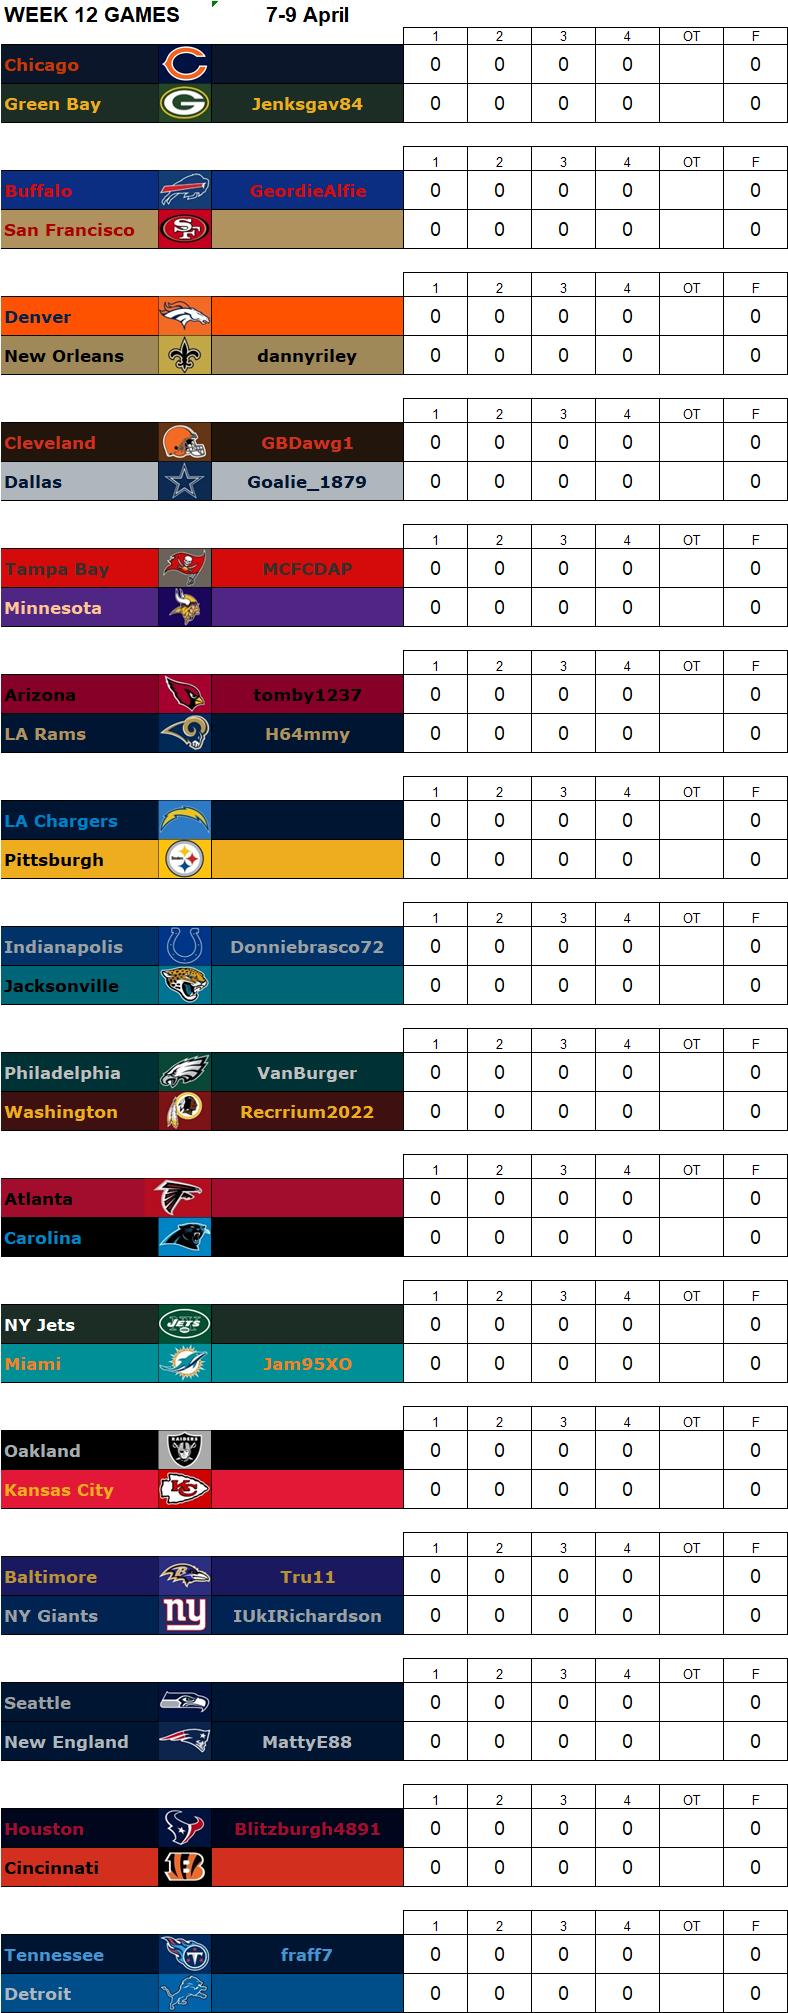 Week 12 Matchups, 7-9 April W12g15